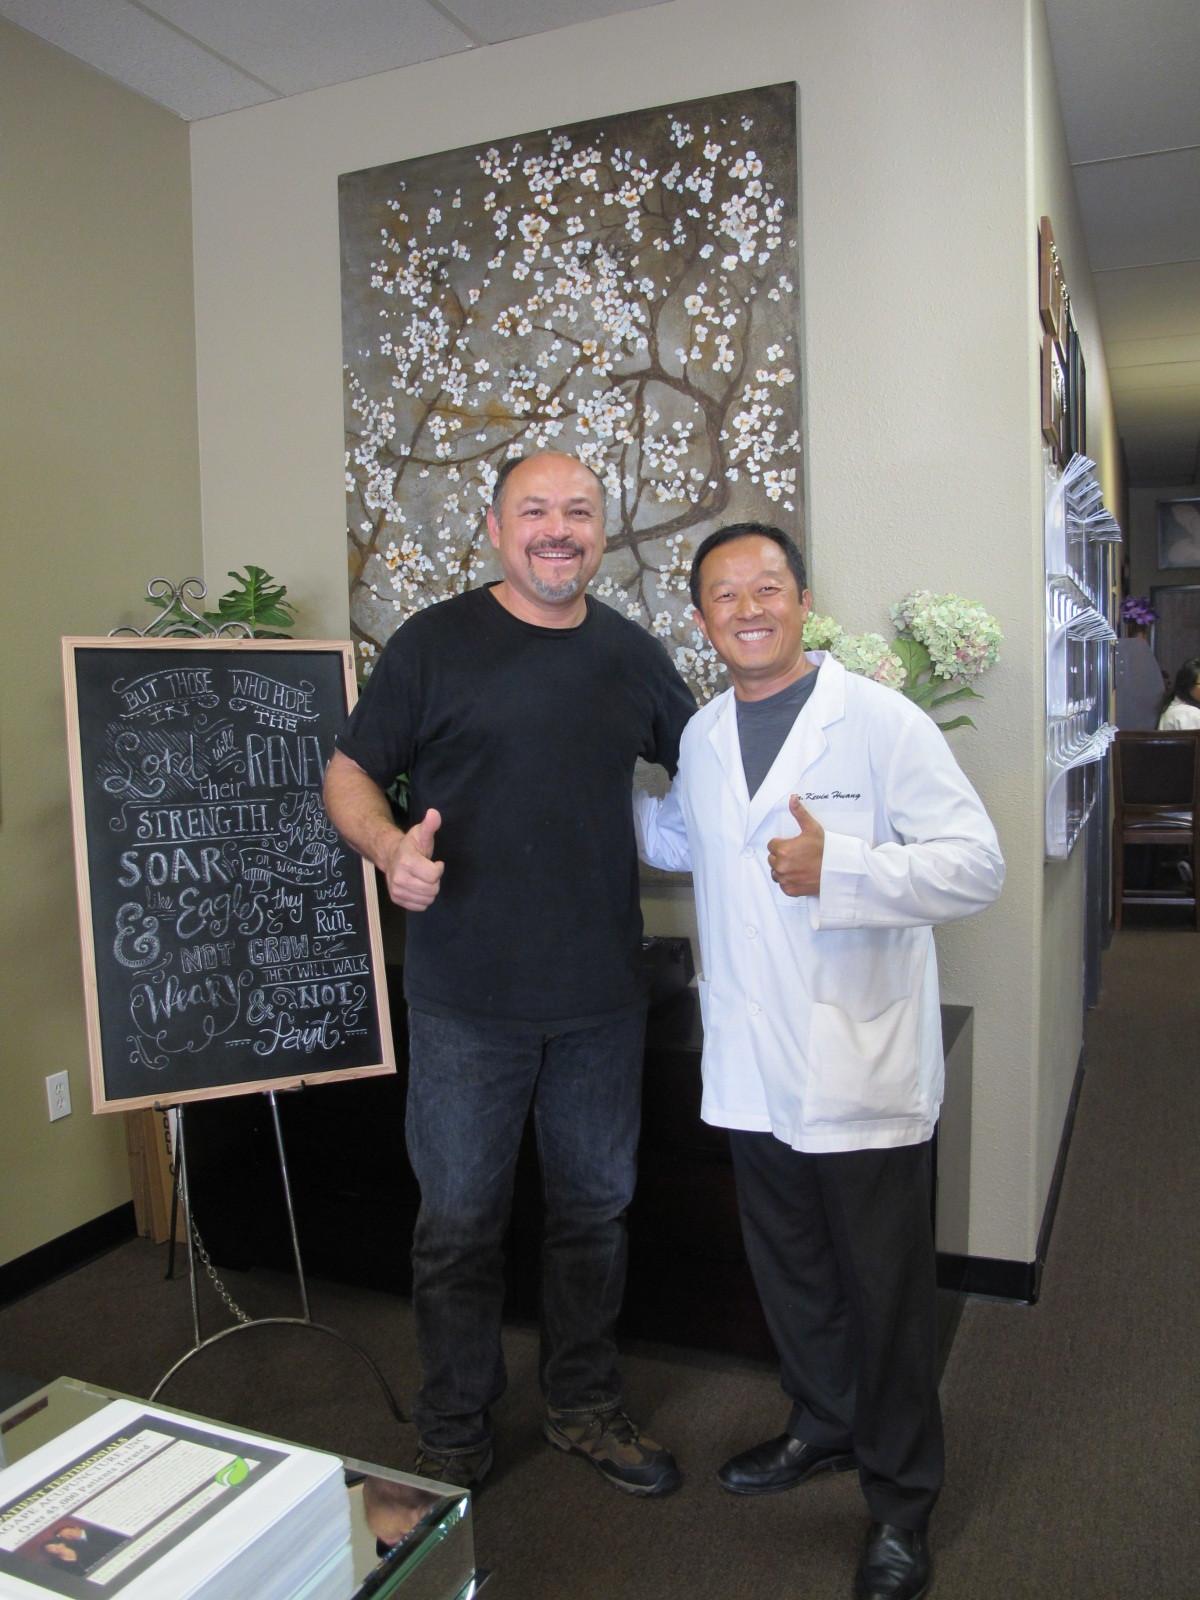 SCIATIC NERVE PAIN | BACK PAIN | LOWER BACK DEGENERATION | Dr. Kevin Huang put me back into business!